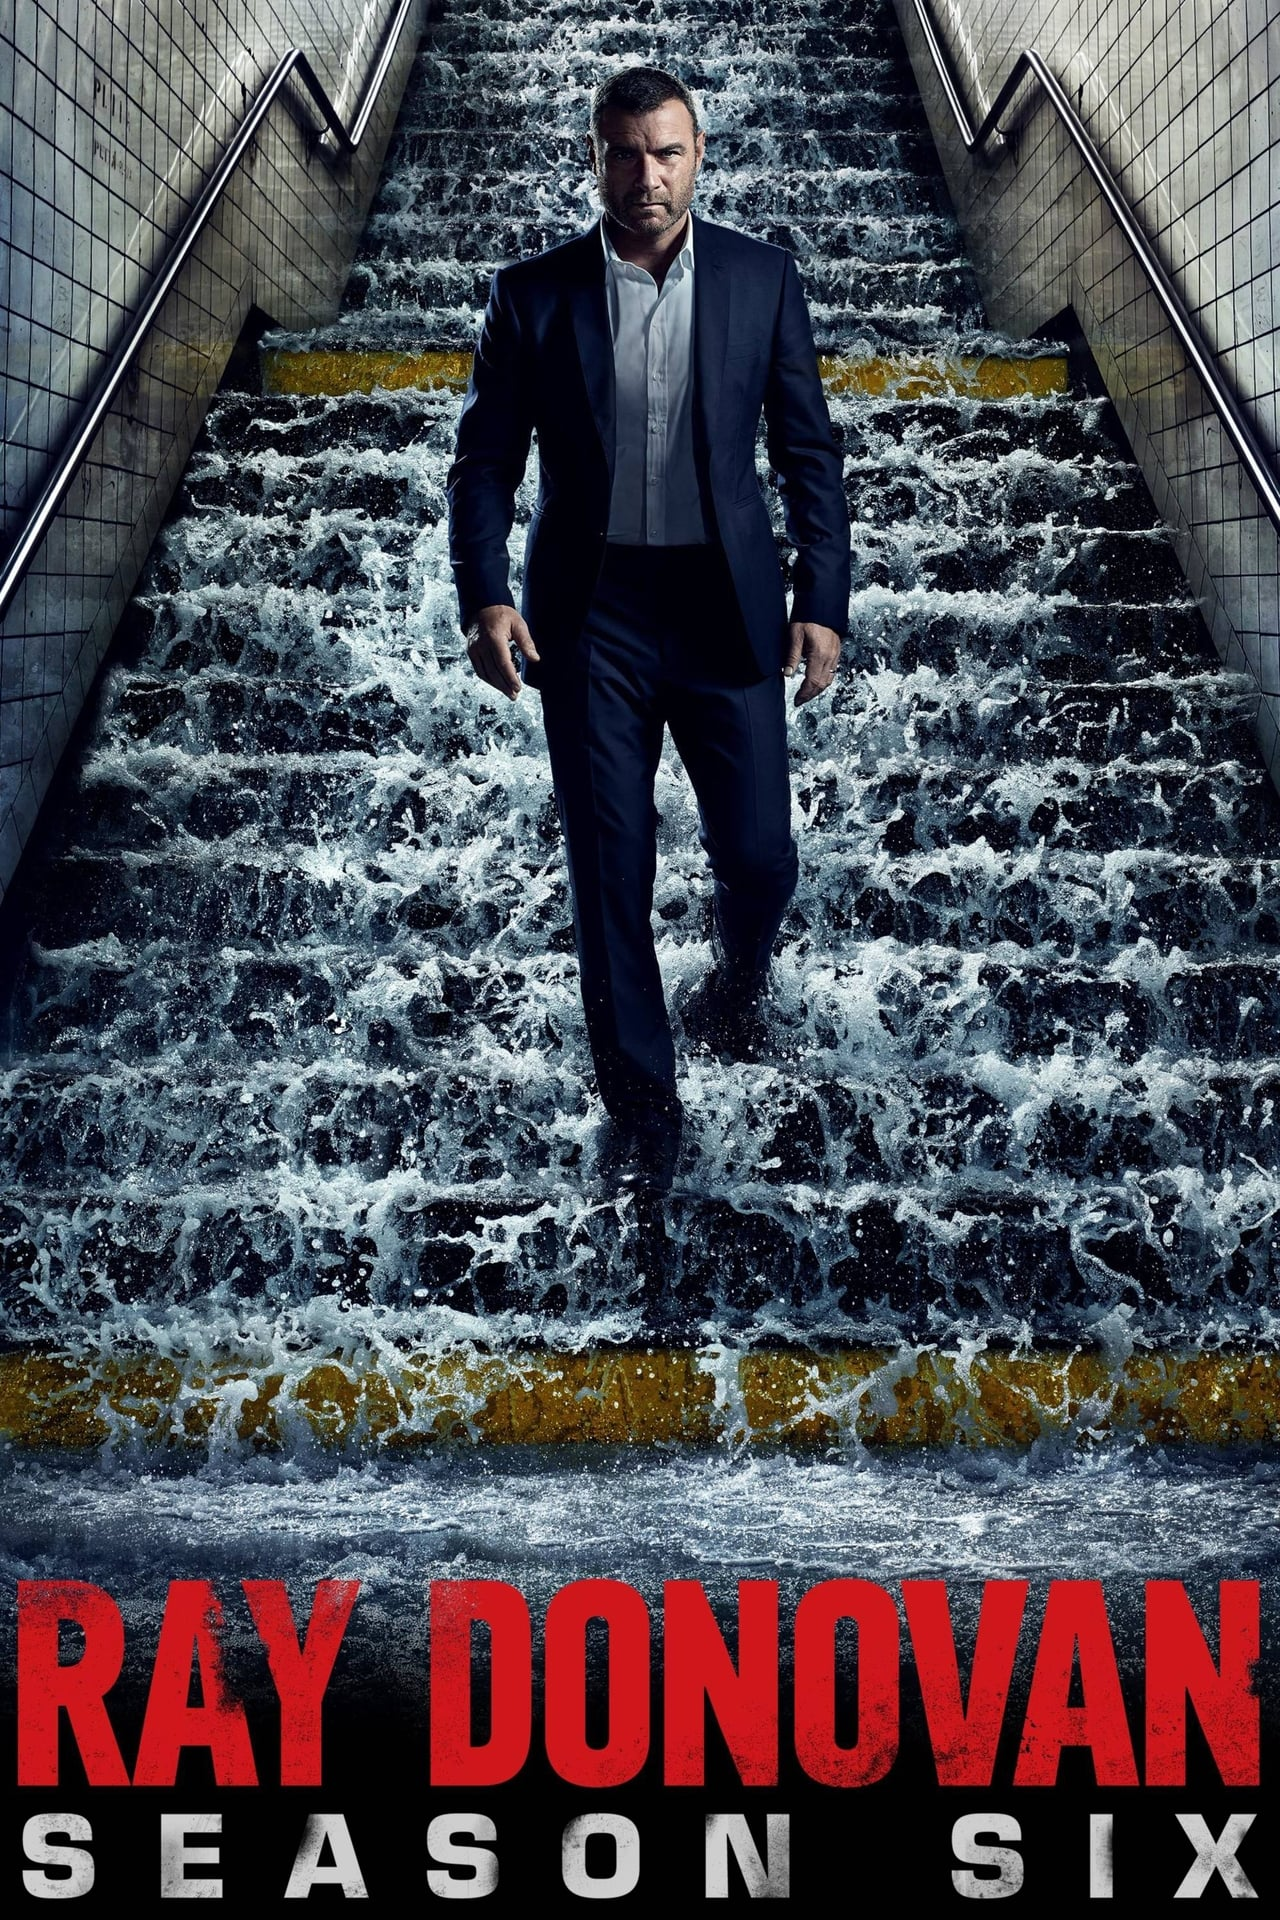 Watch Ray Donovan Season 6 Online